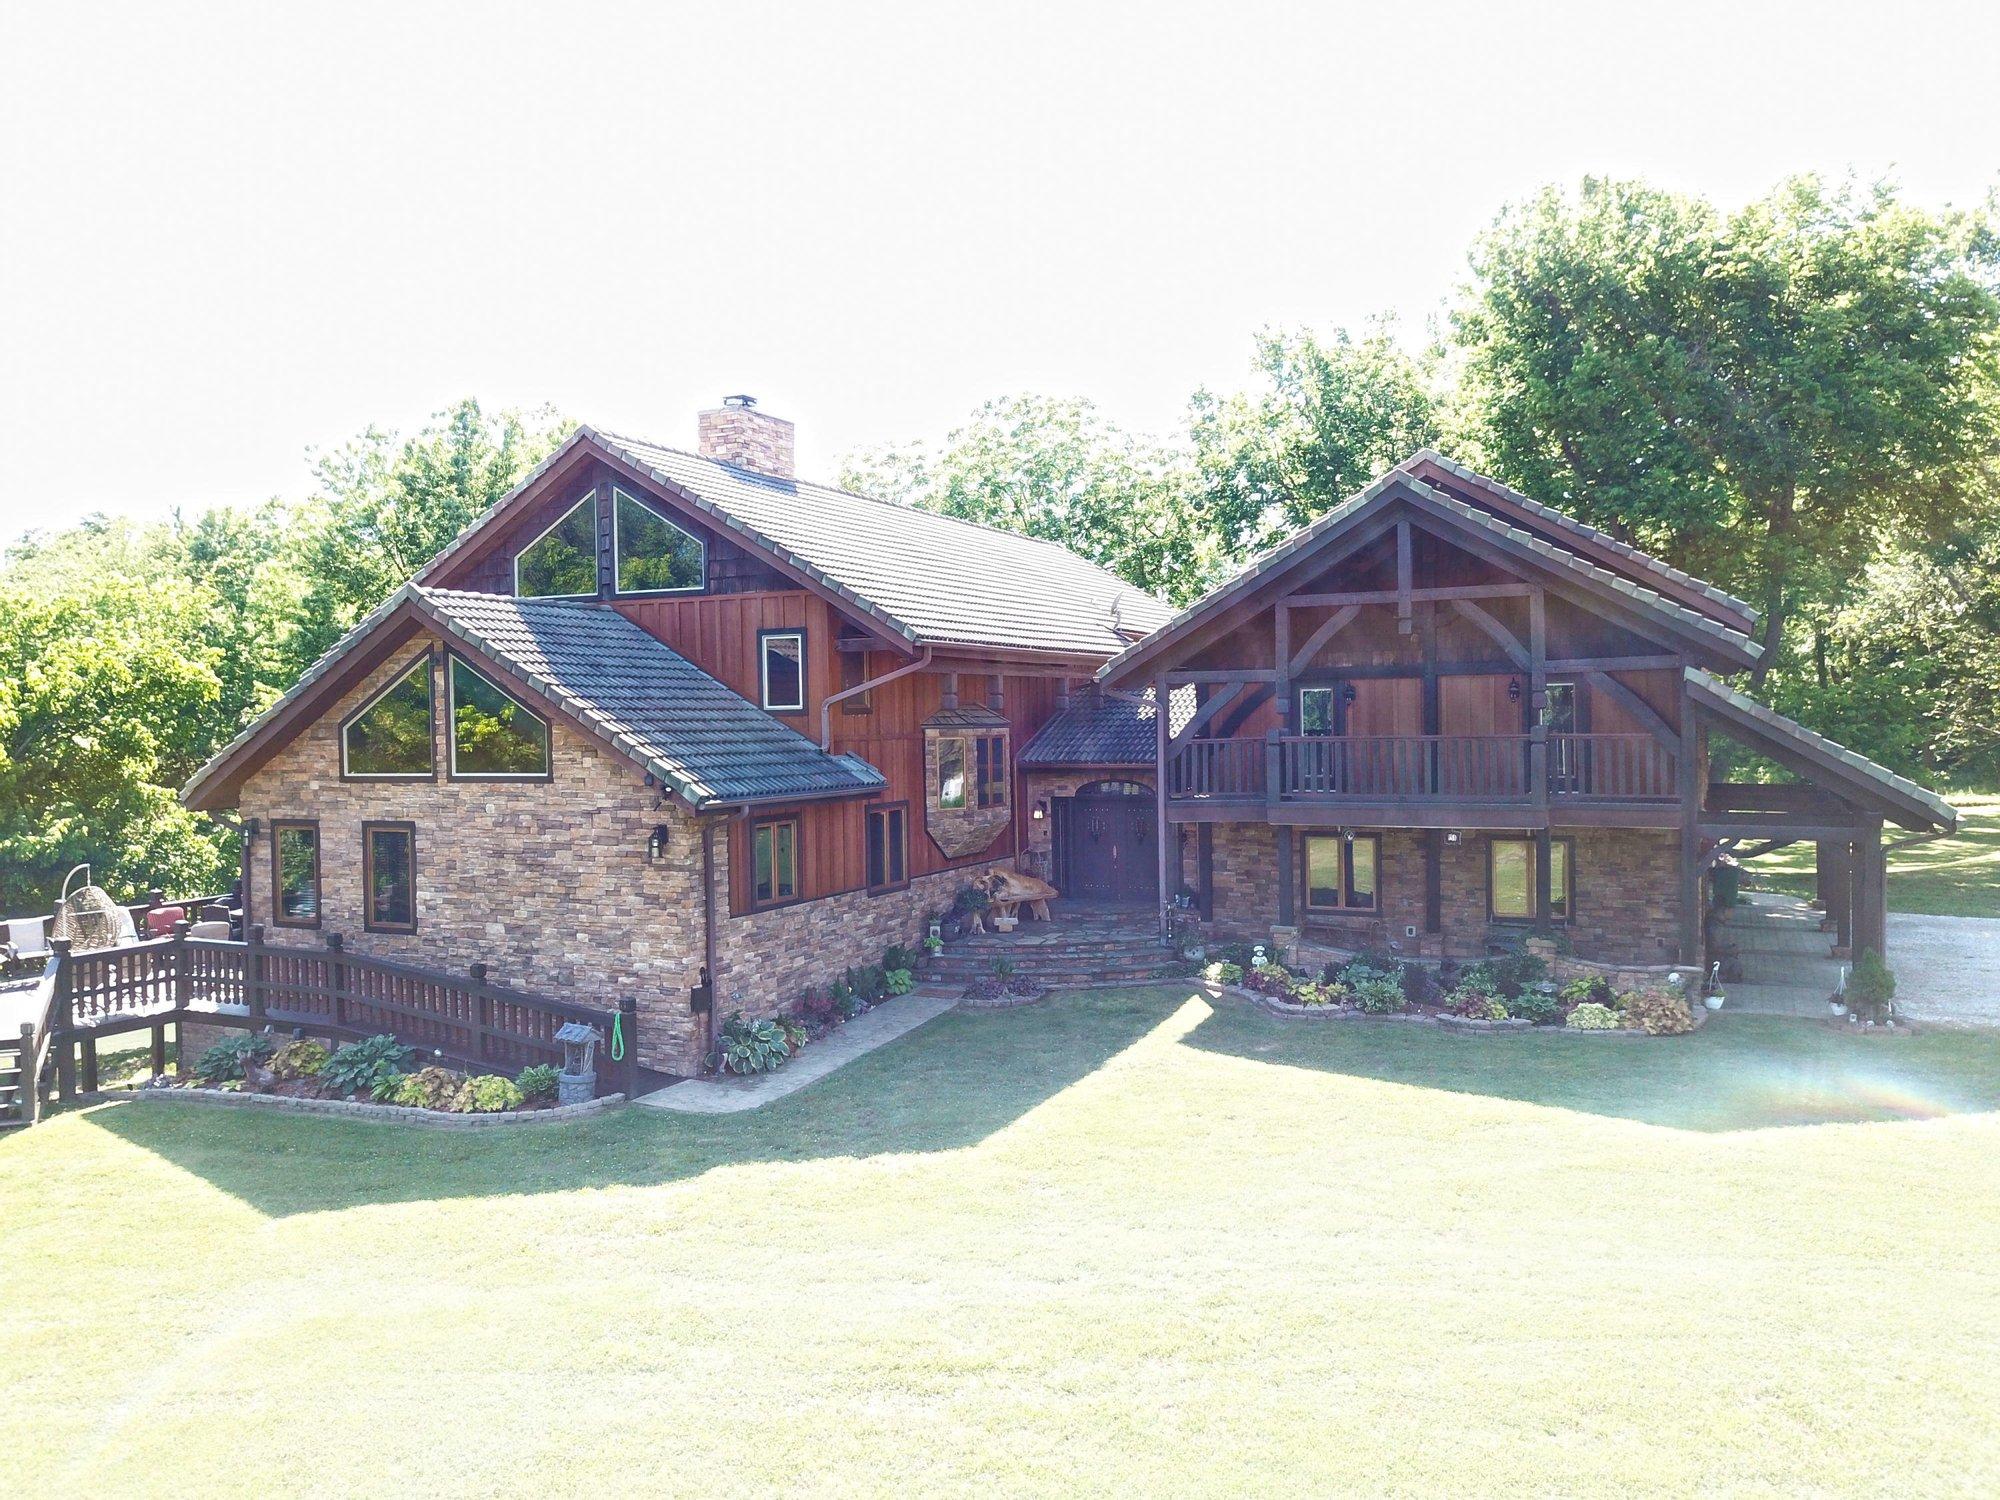 House in Missouri, United States 1